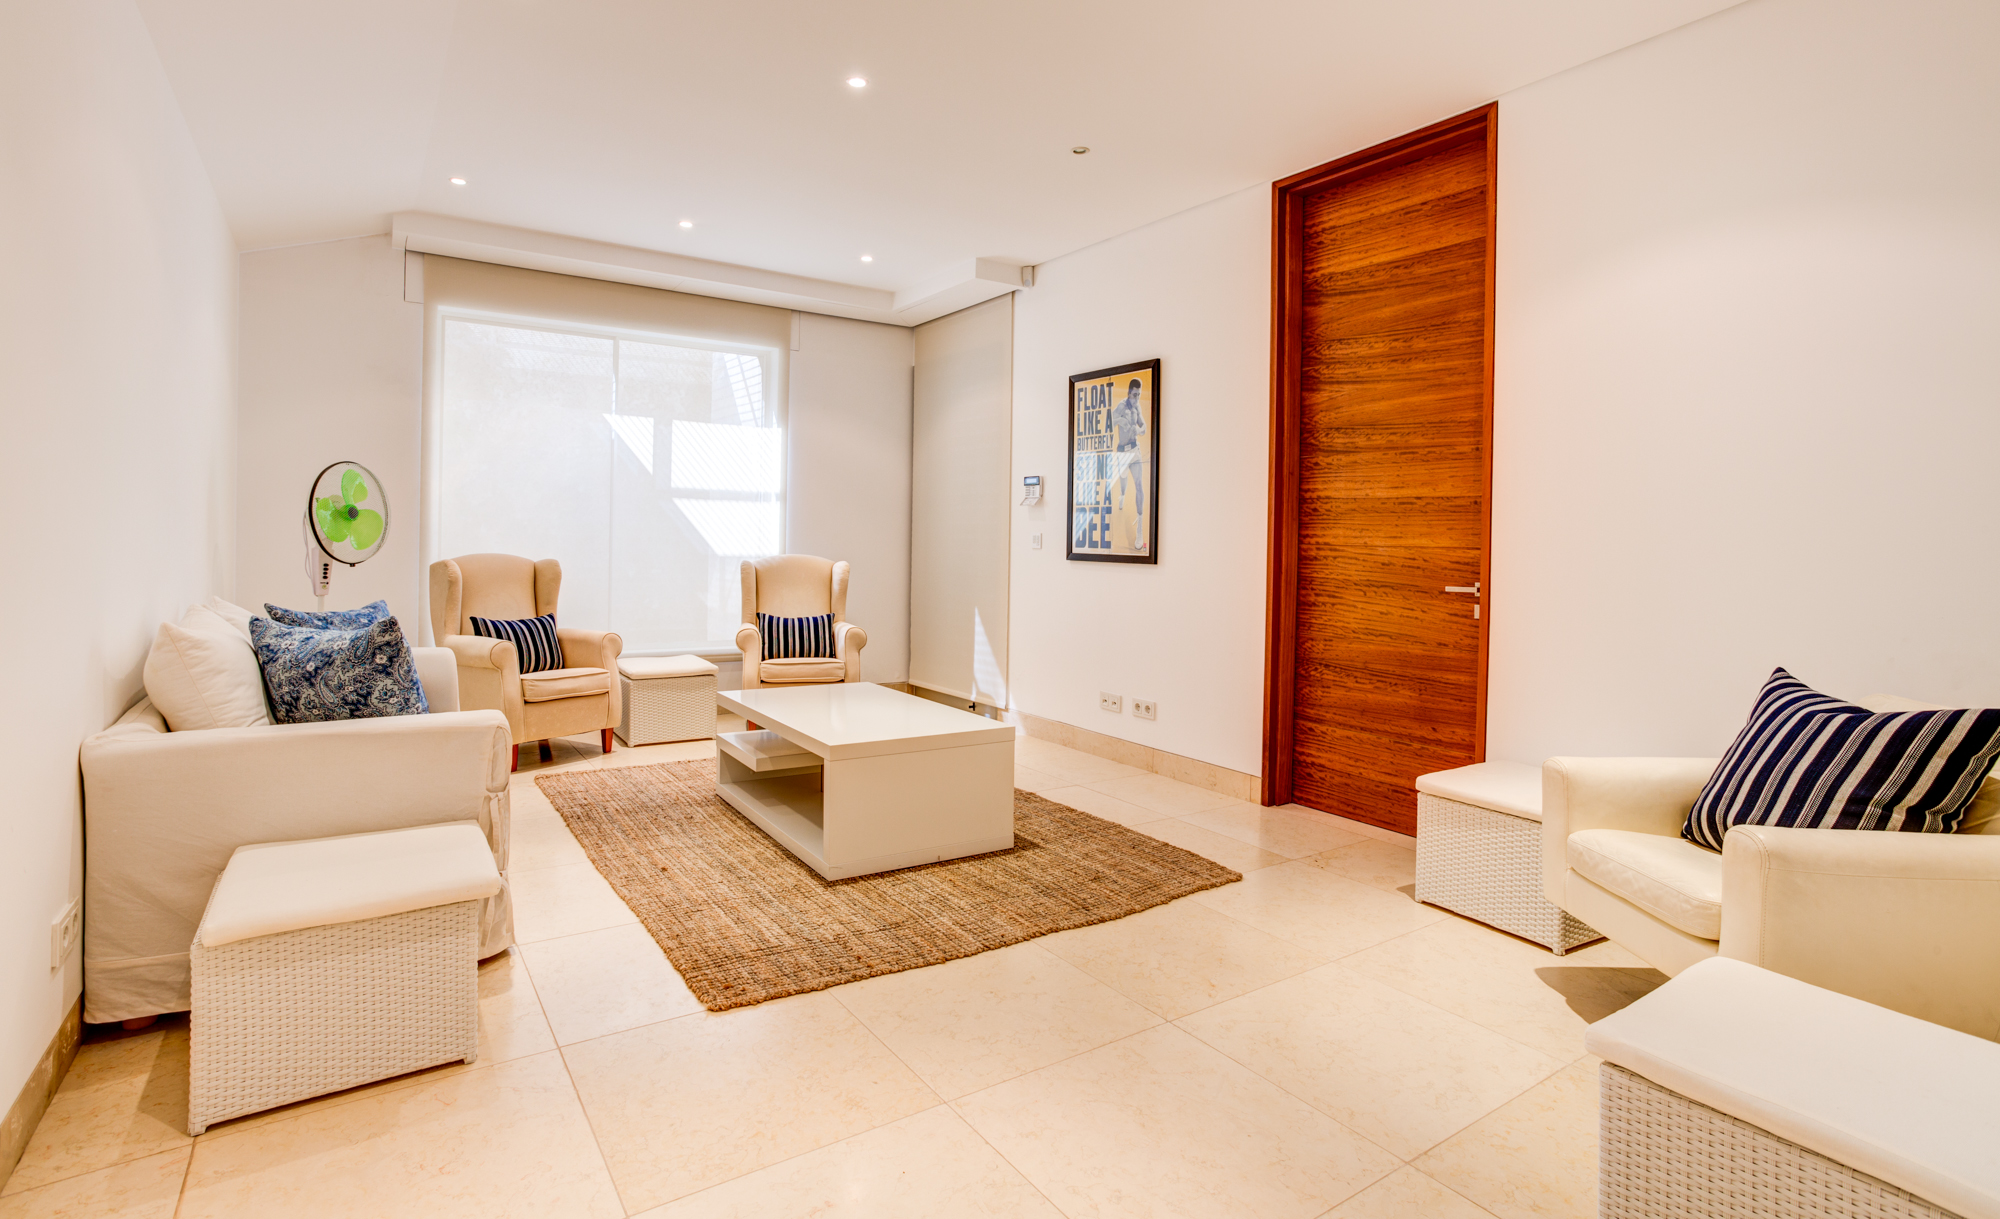 Villa Moon Sone, 5 bedroom prestige villa in Quinta do Lago, Algarve,lounge 1.jpg